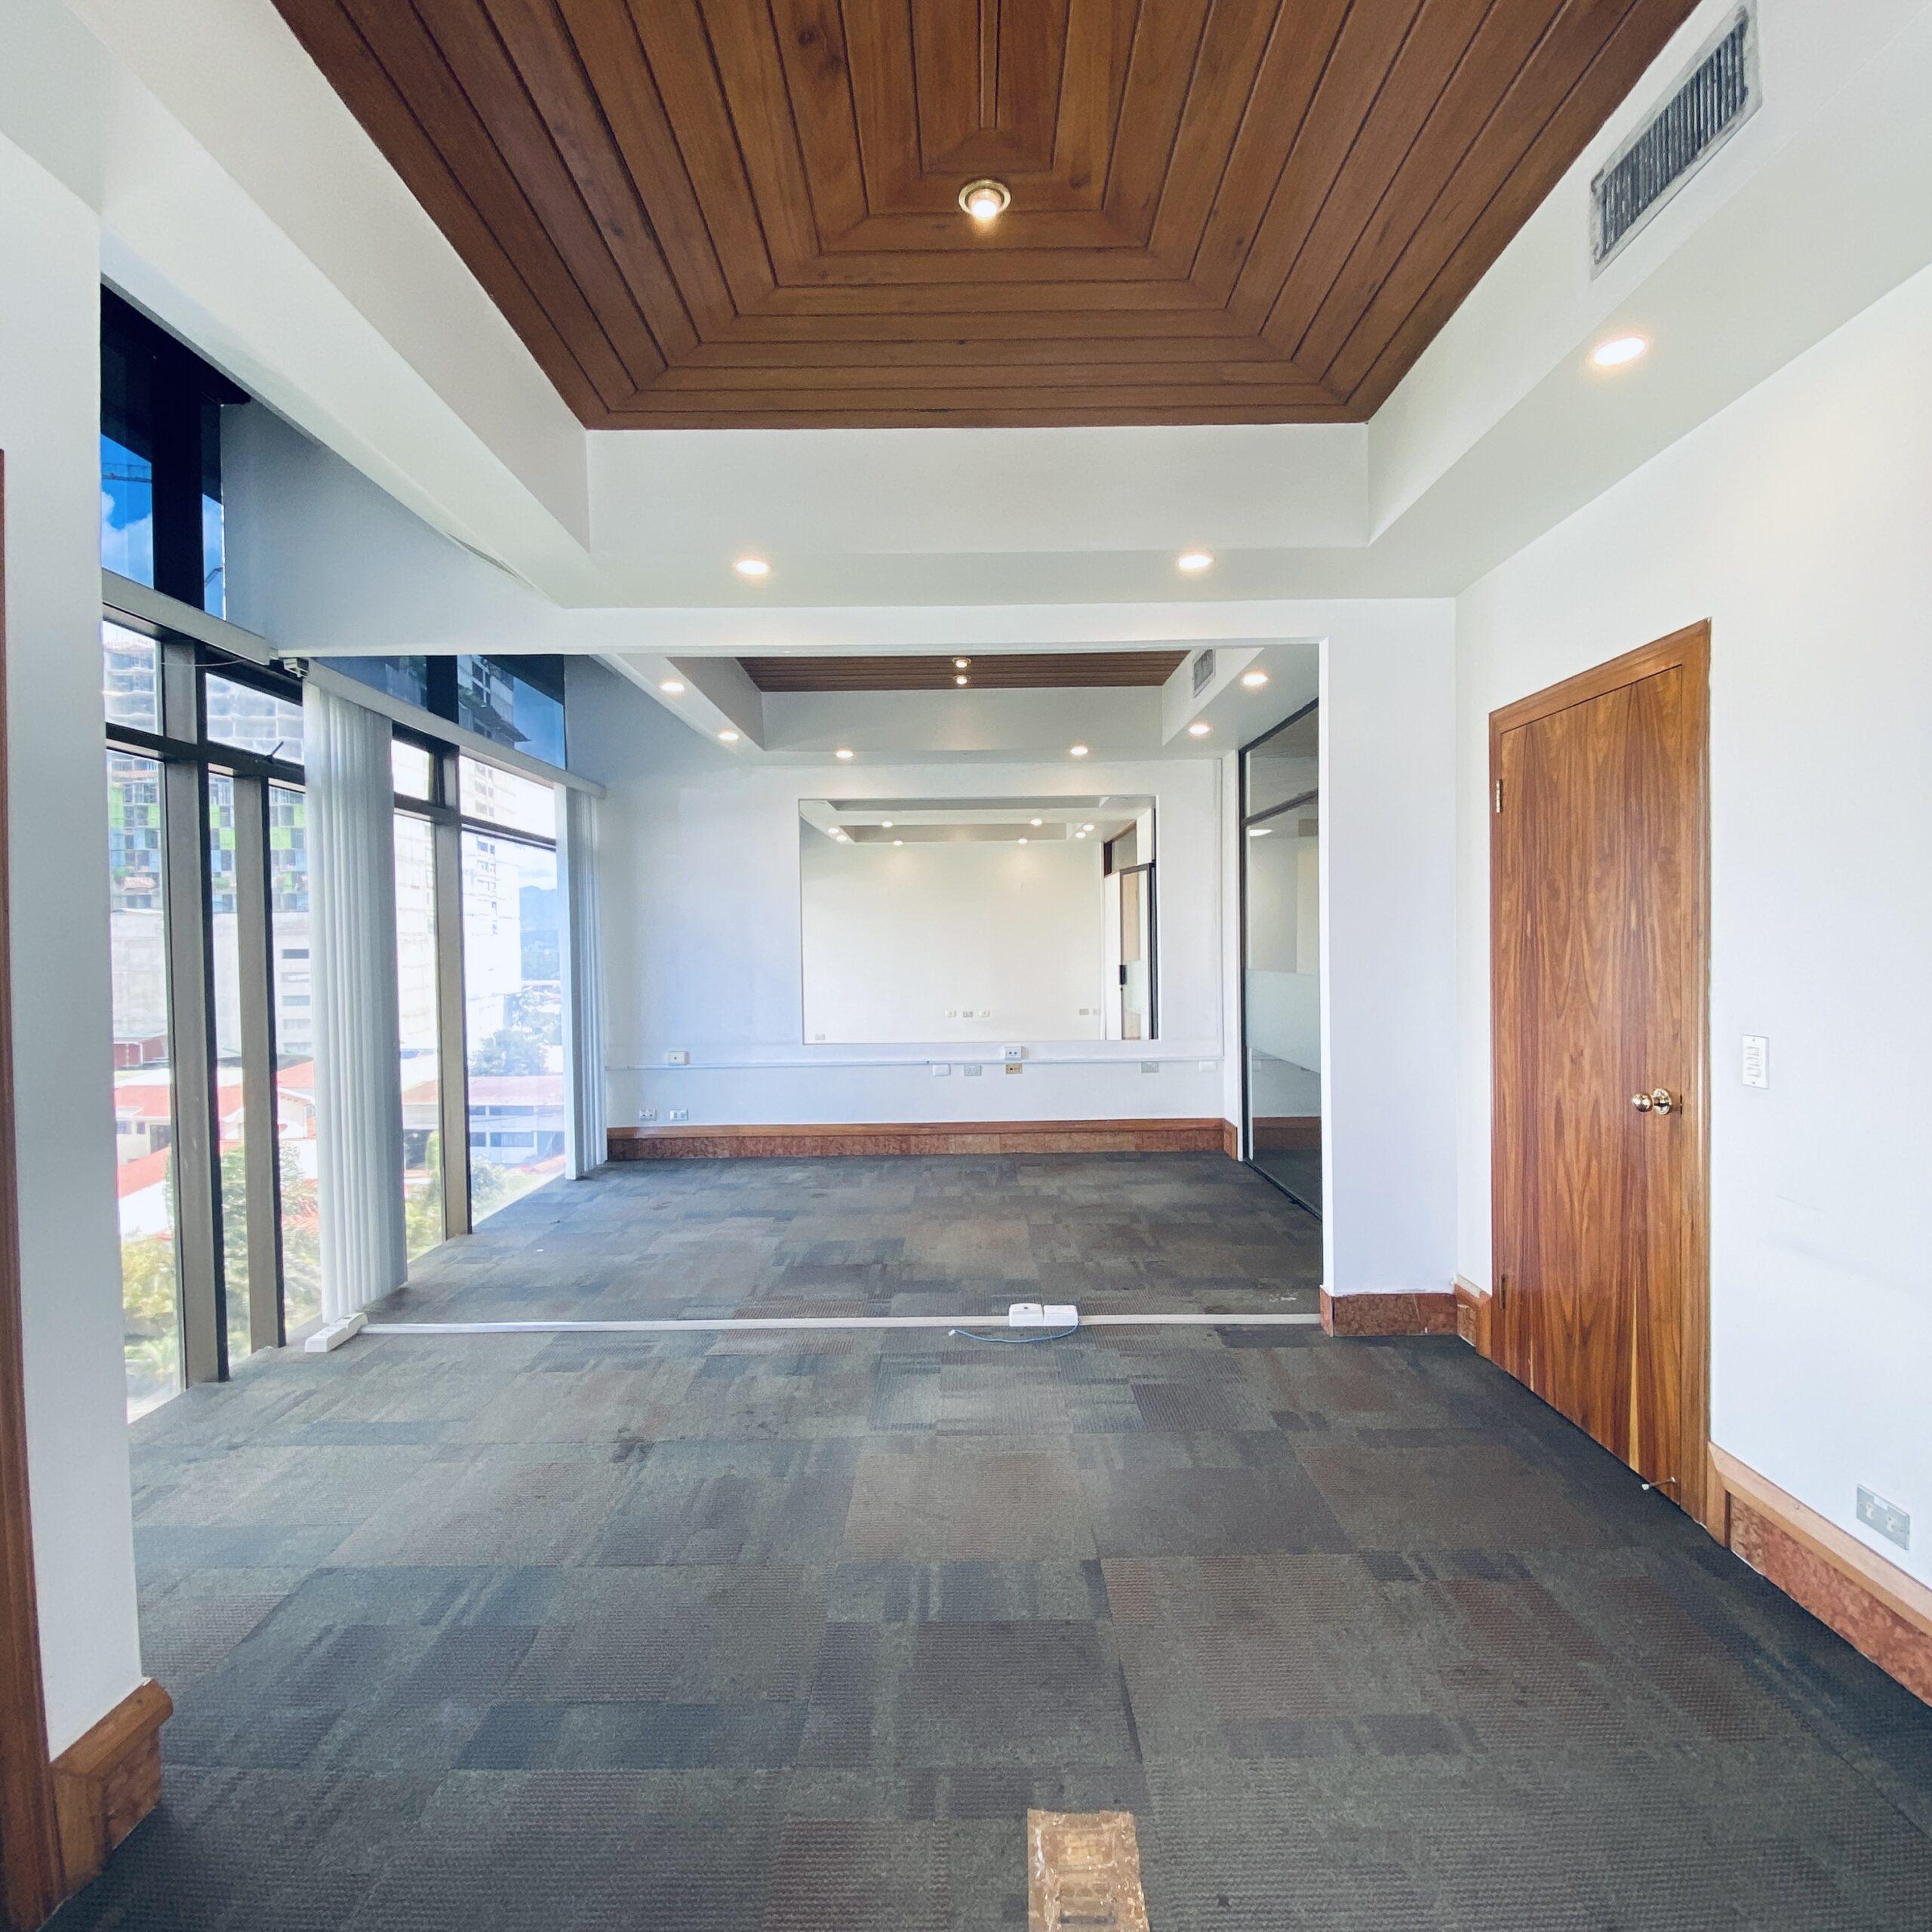 Alquiler de Oficina de 173.77 m2